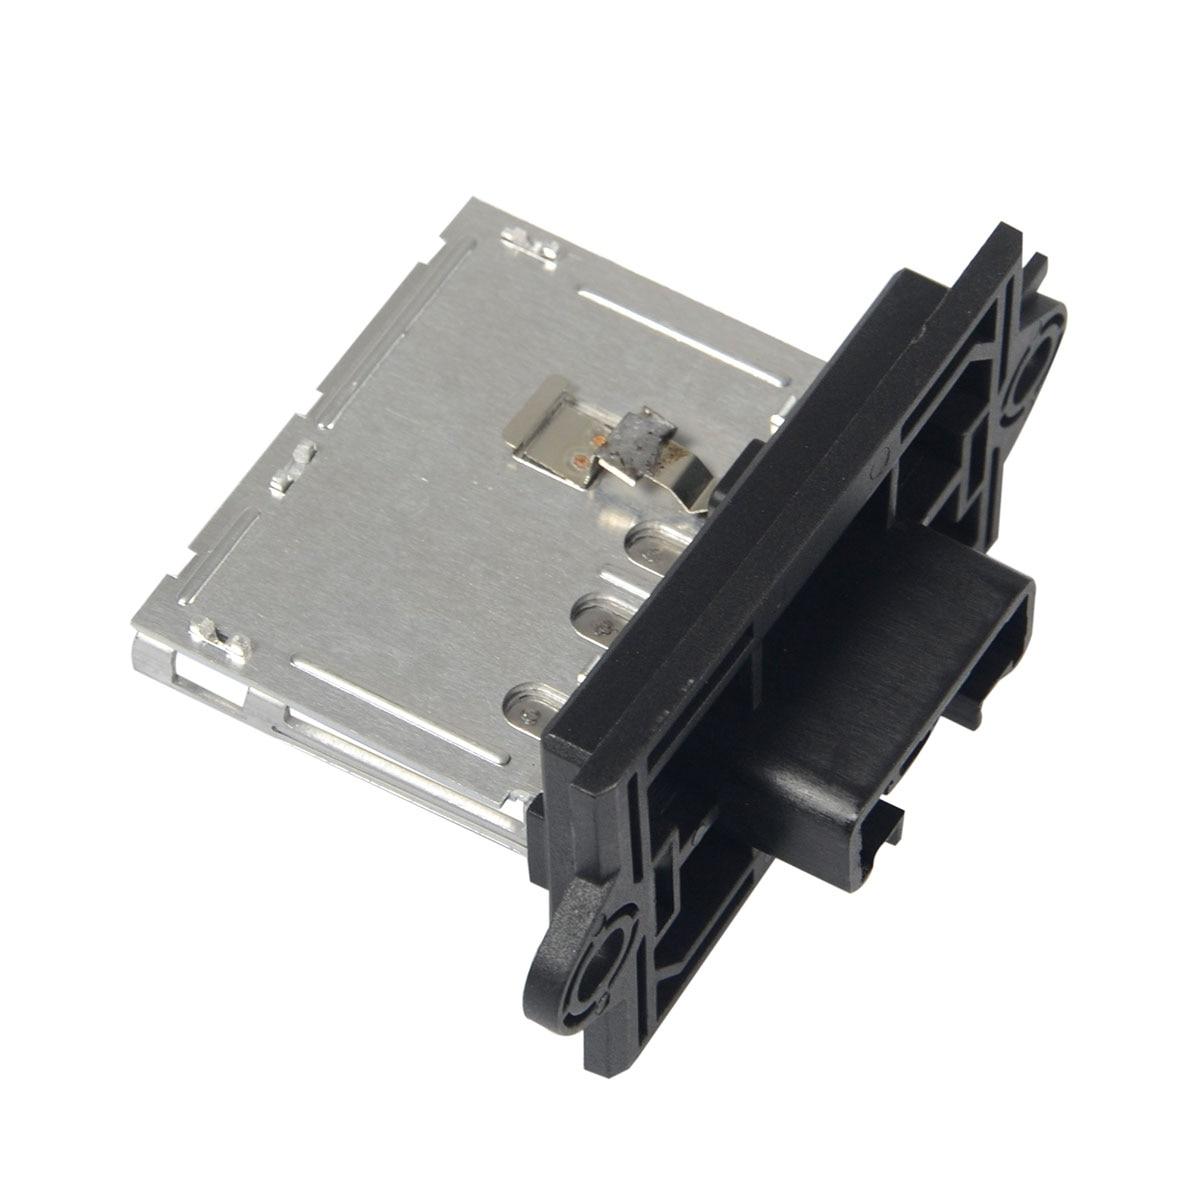 AC Heater Blower Motor Resistor for Nissan Versa 2007-2011 Tiida 2007-2009 Cube 2009-2010